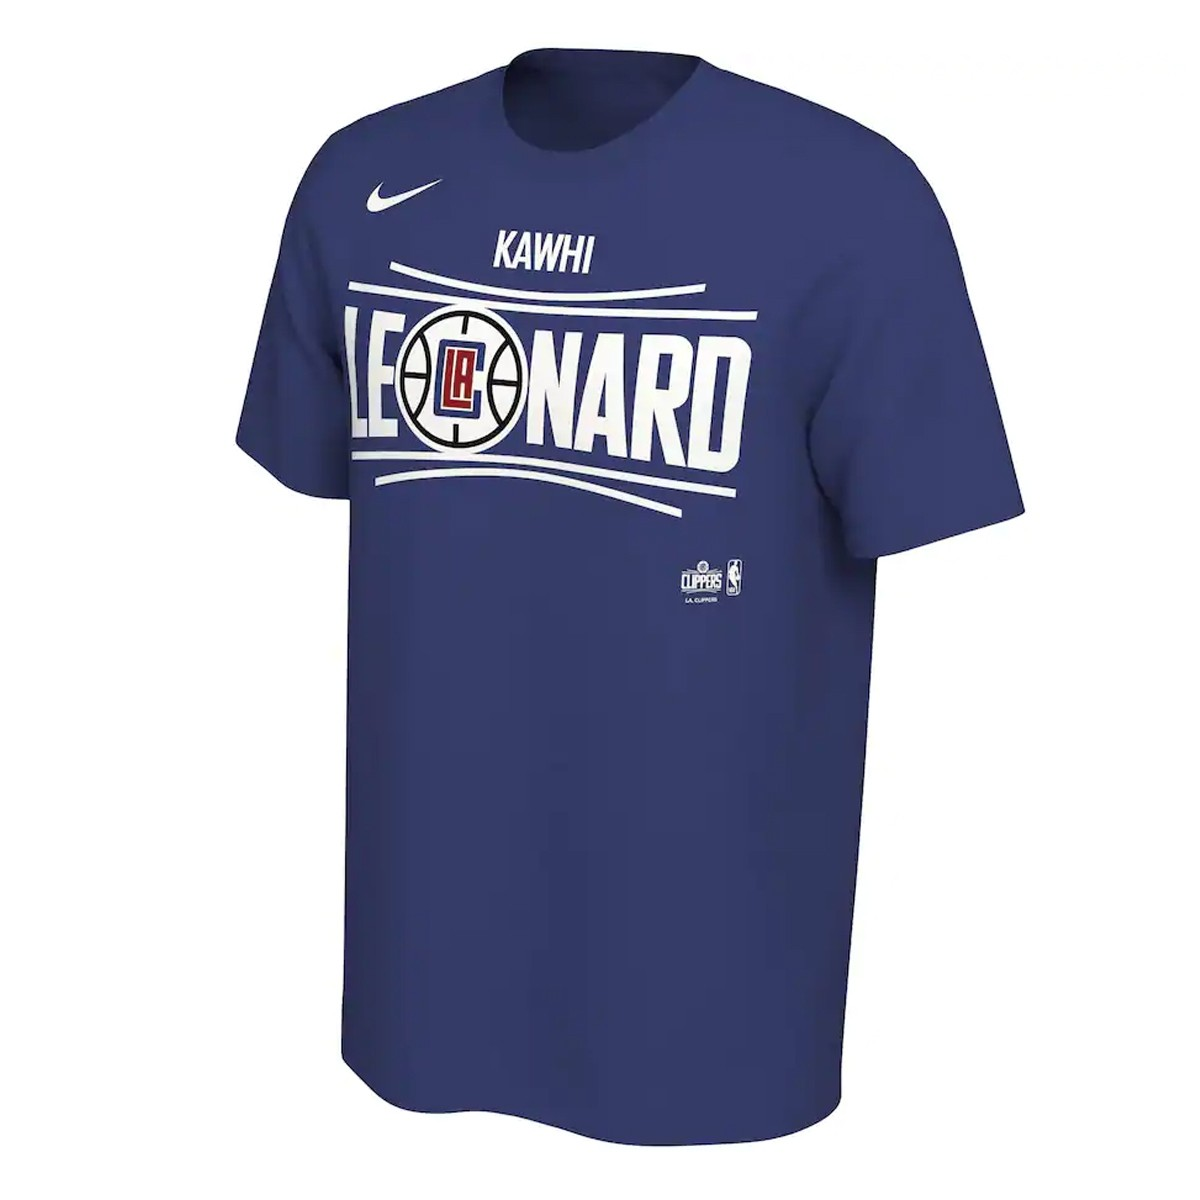 NBA Junior New City Player Tee Clippers 'Leonard'